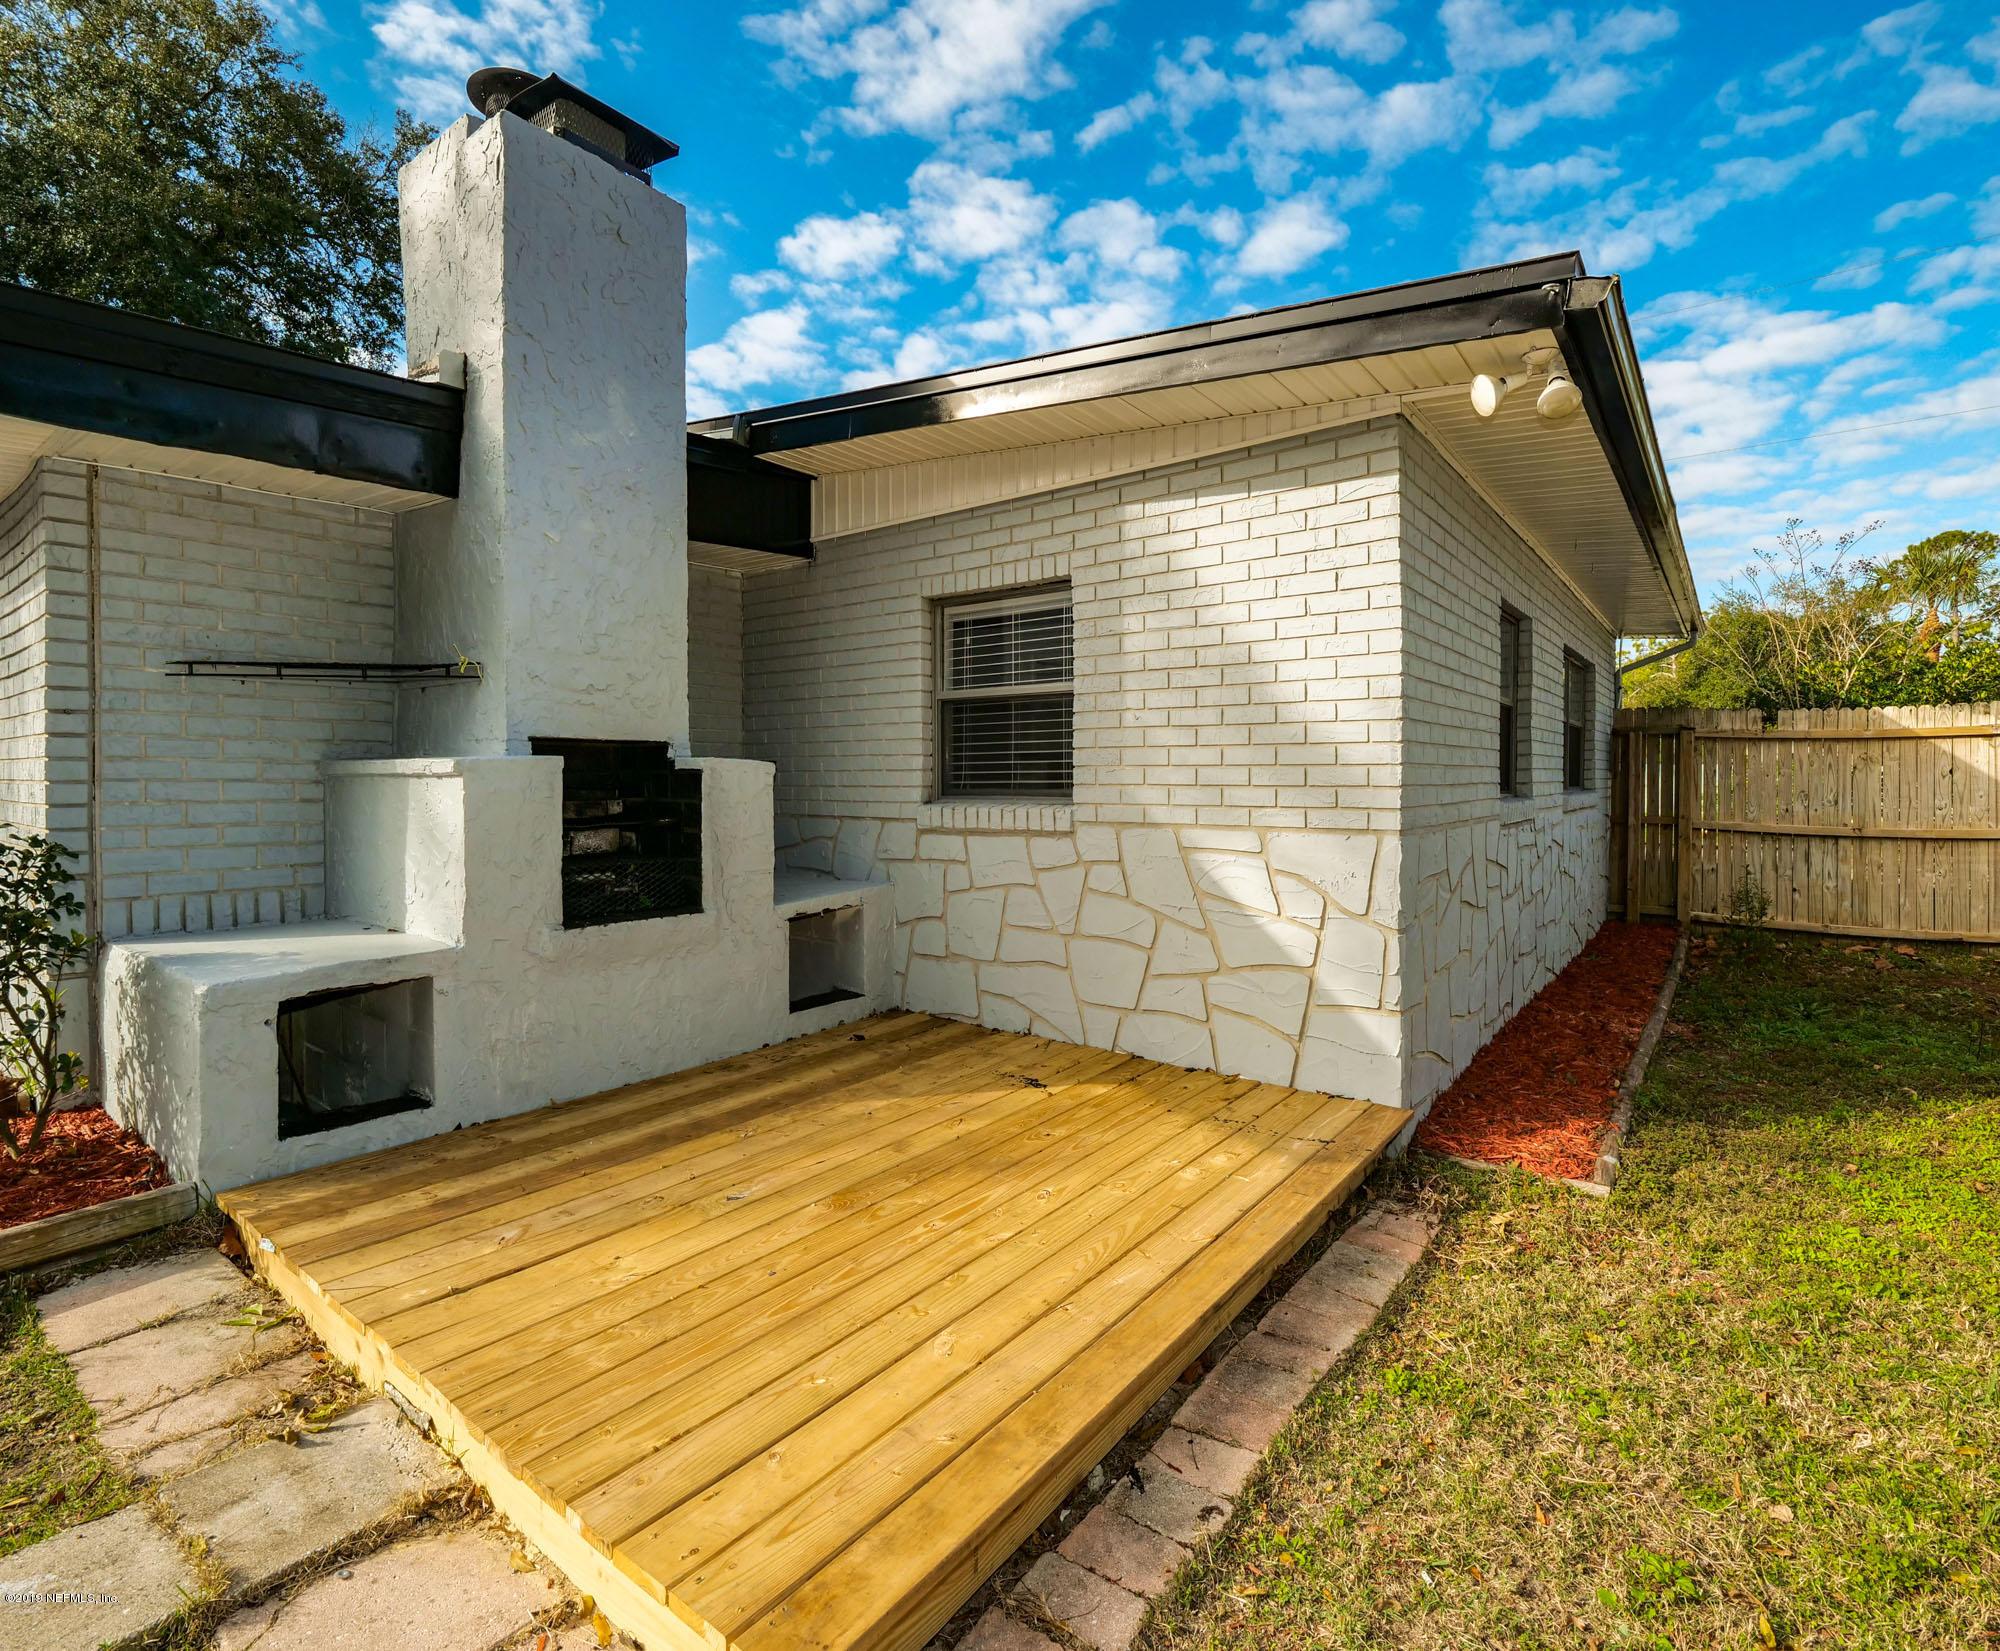 1620 BENTIN, JACKSONVILLE BEACH, FLORIDA 32250, 4 Bedrooms Bedrooms, ,2 BathroomsBathrooms,Residential - single family,For sale,BENTIN,974151